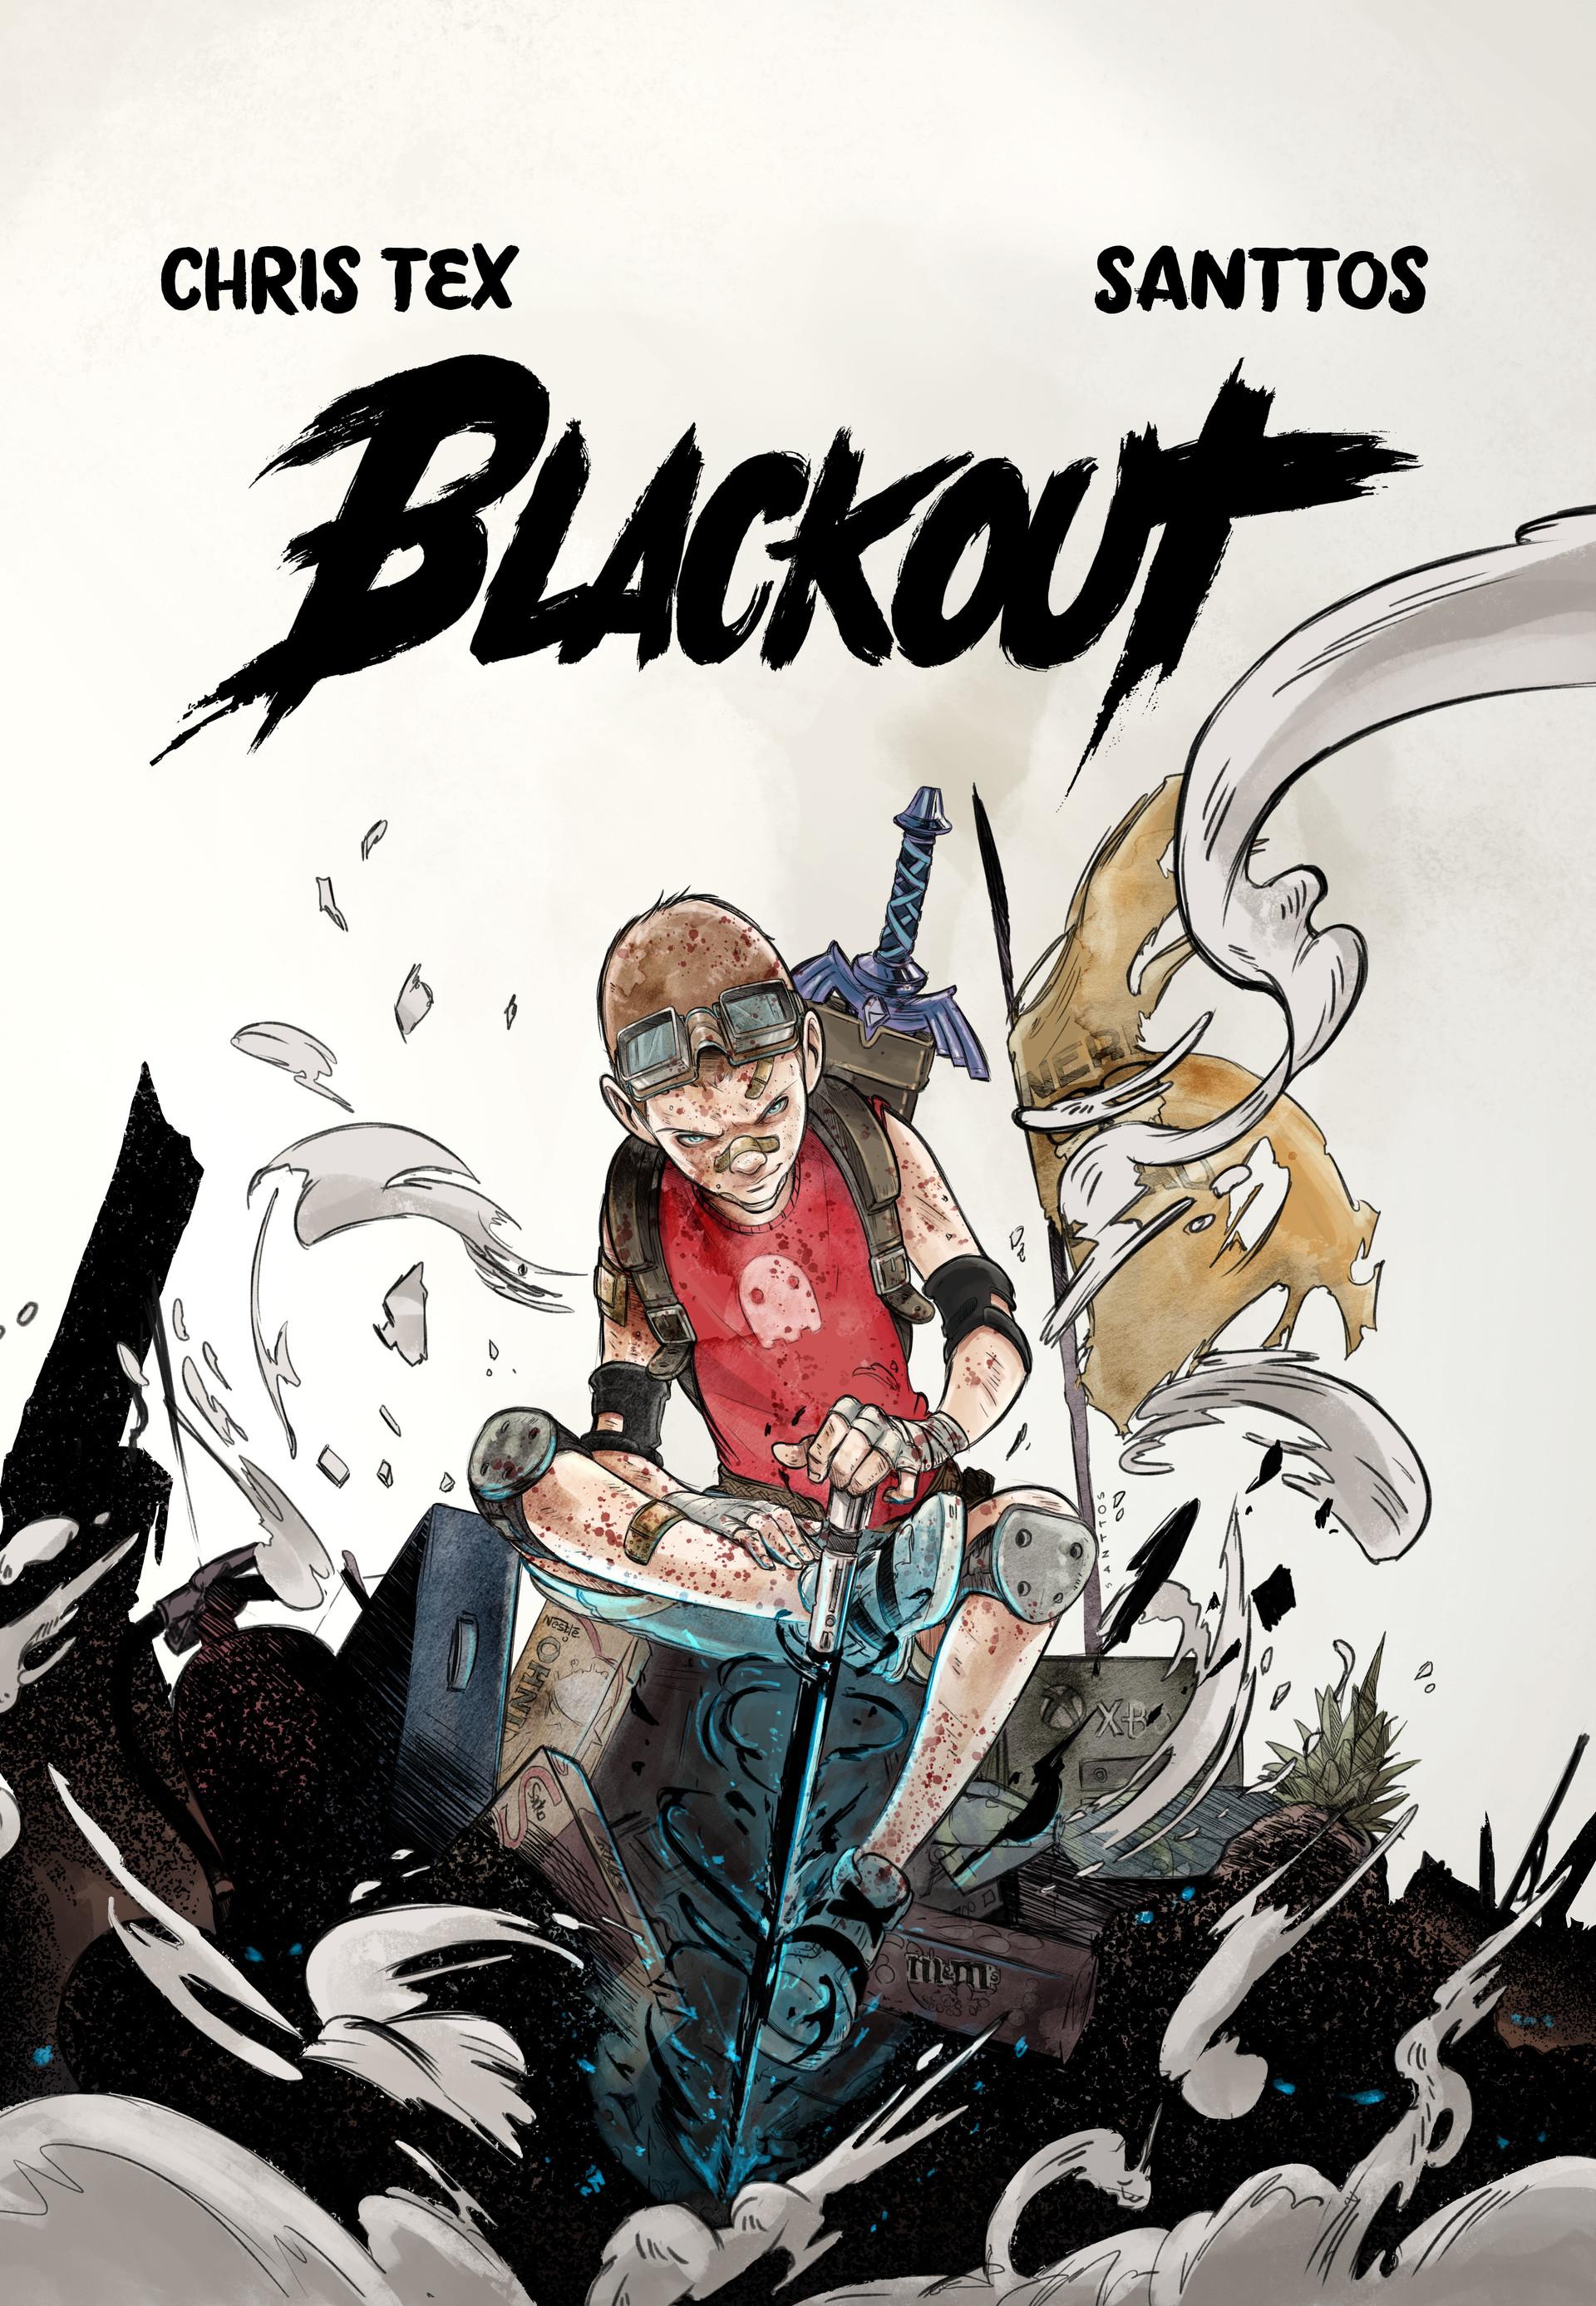 Santtos capa final blackout